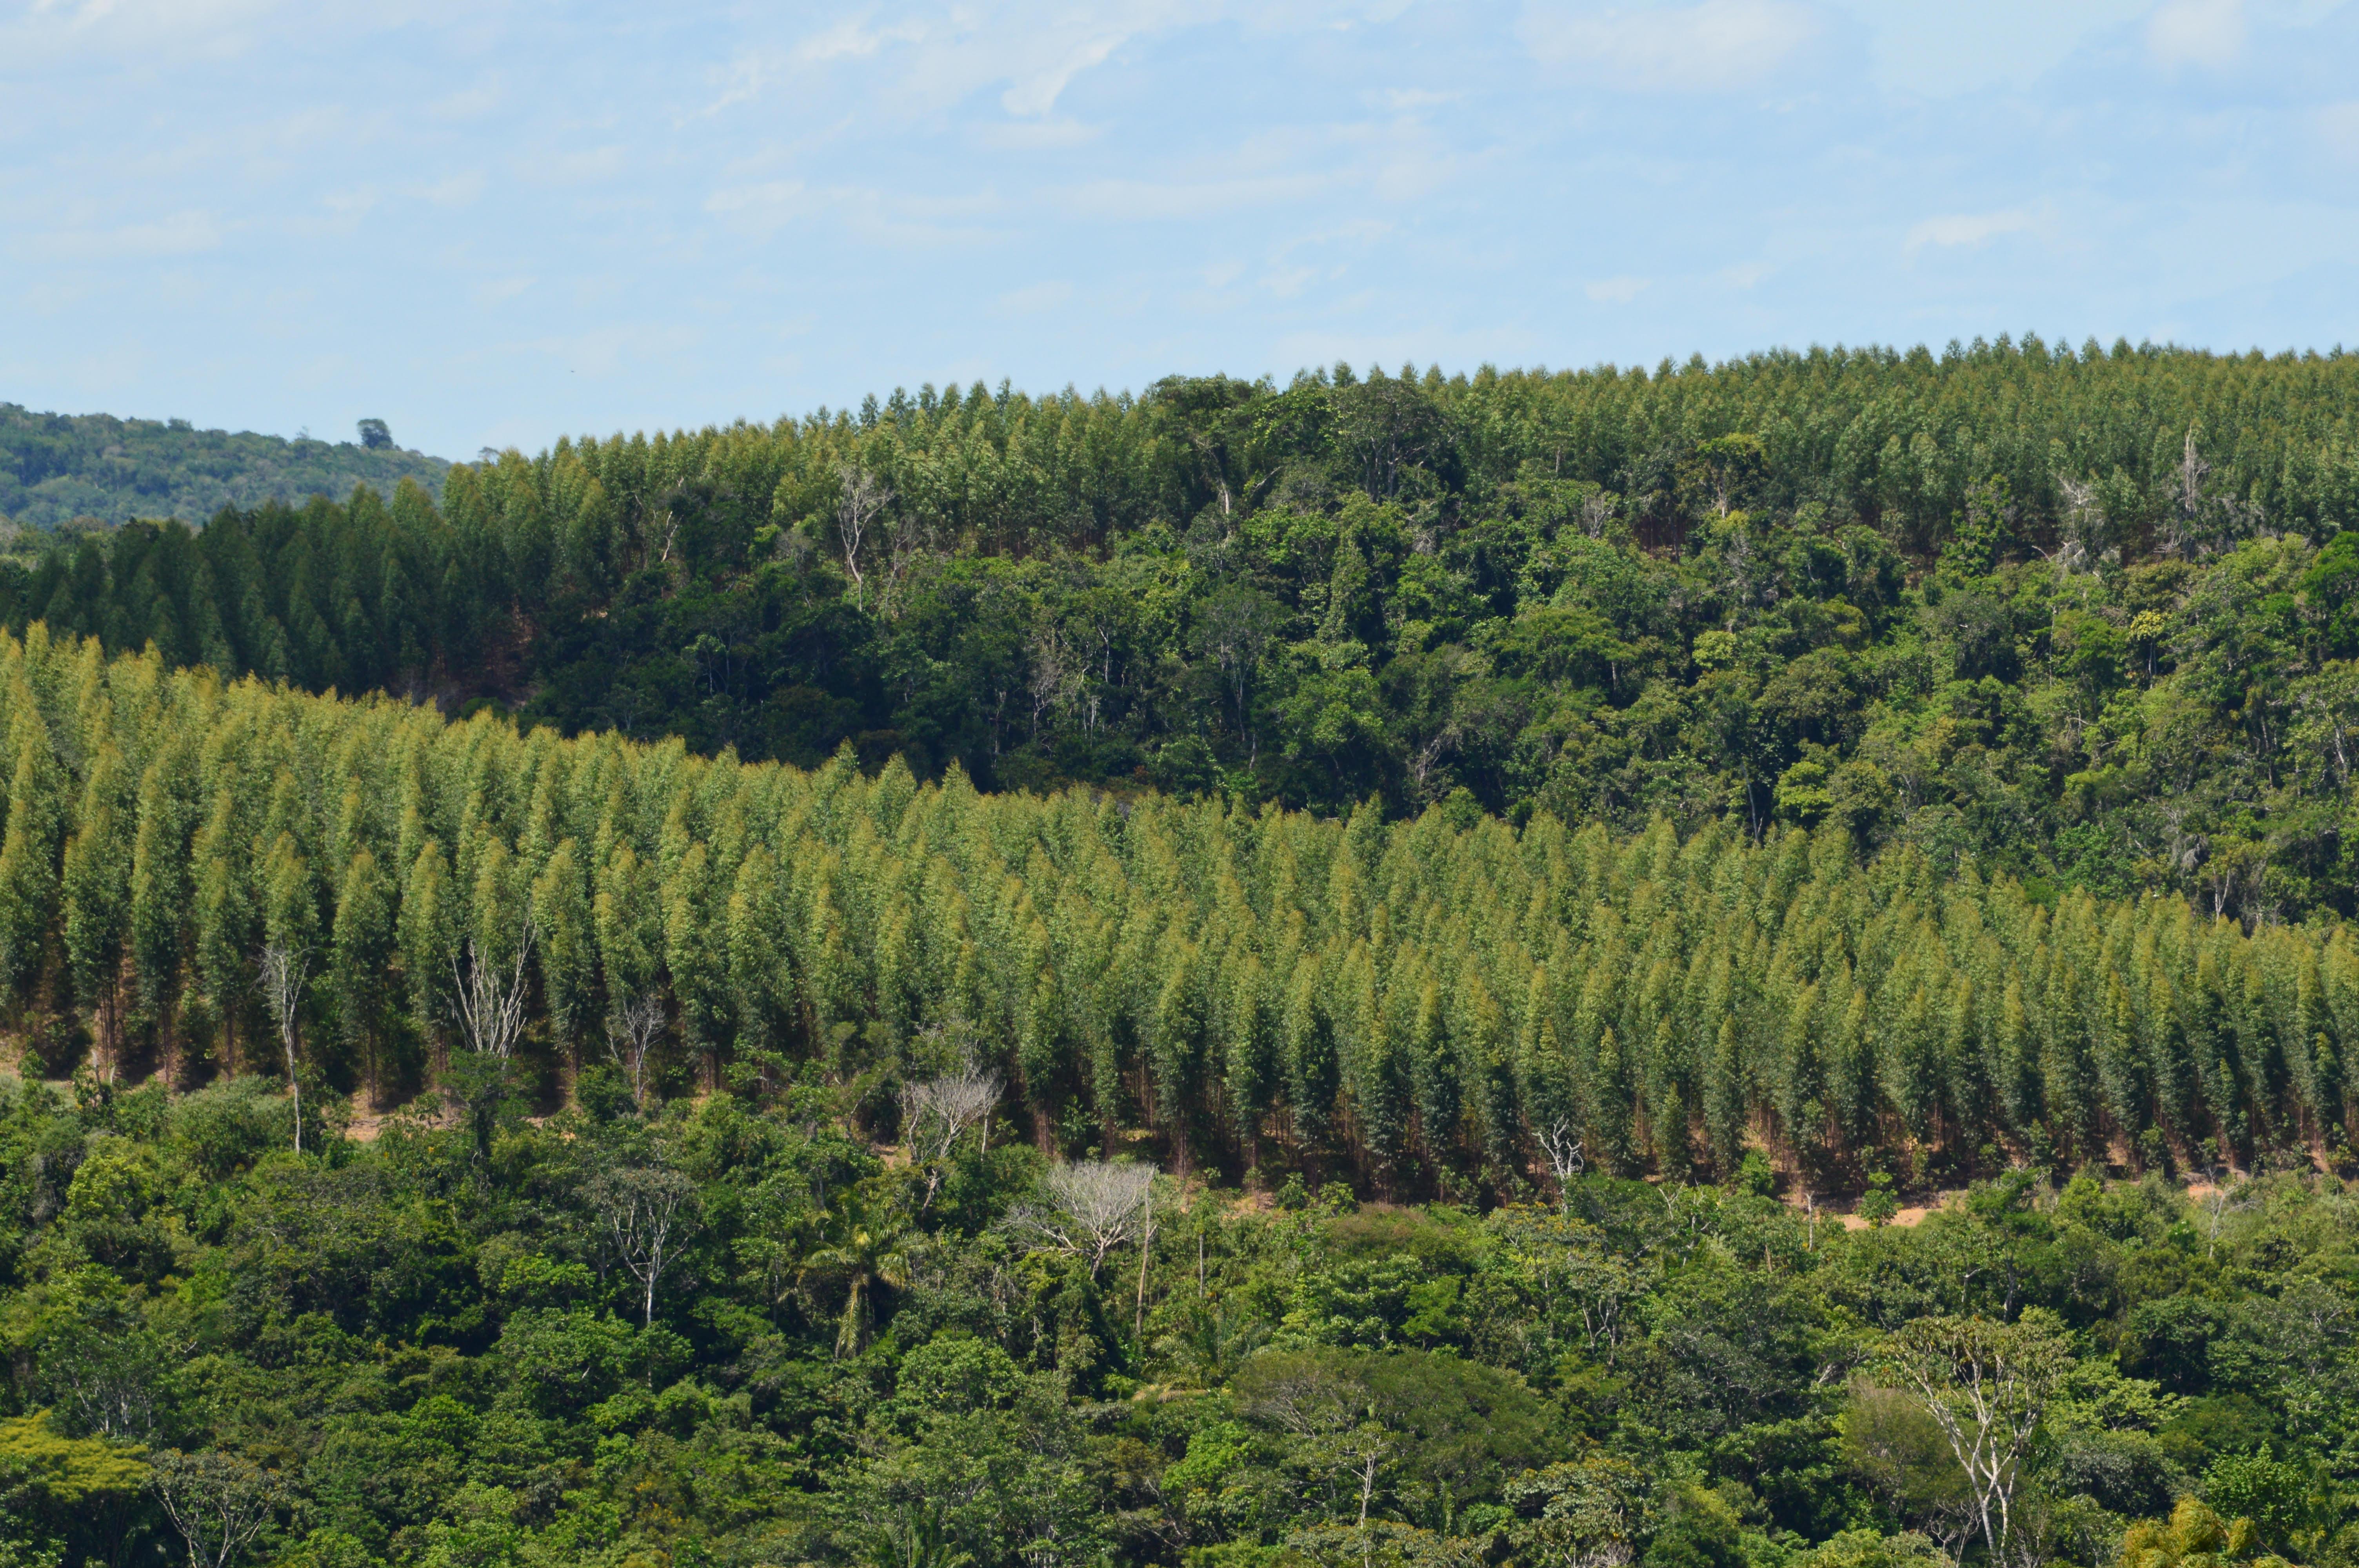 plantios mosaicos eucaliptos e nativas - Acervo Bracell.JPG